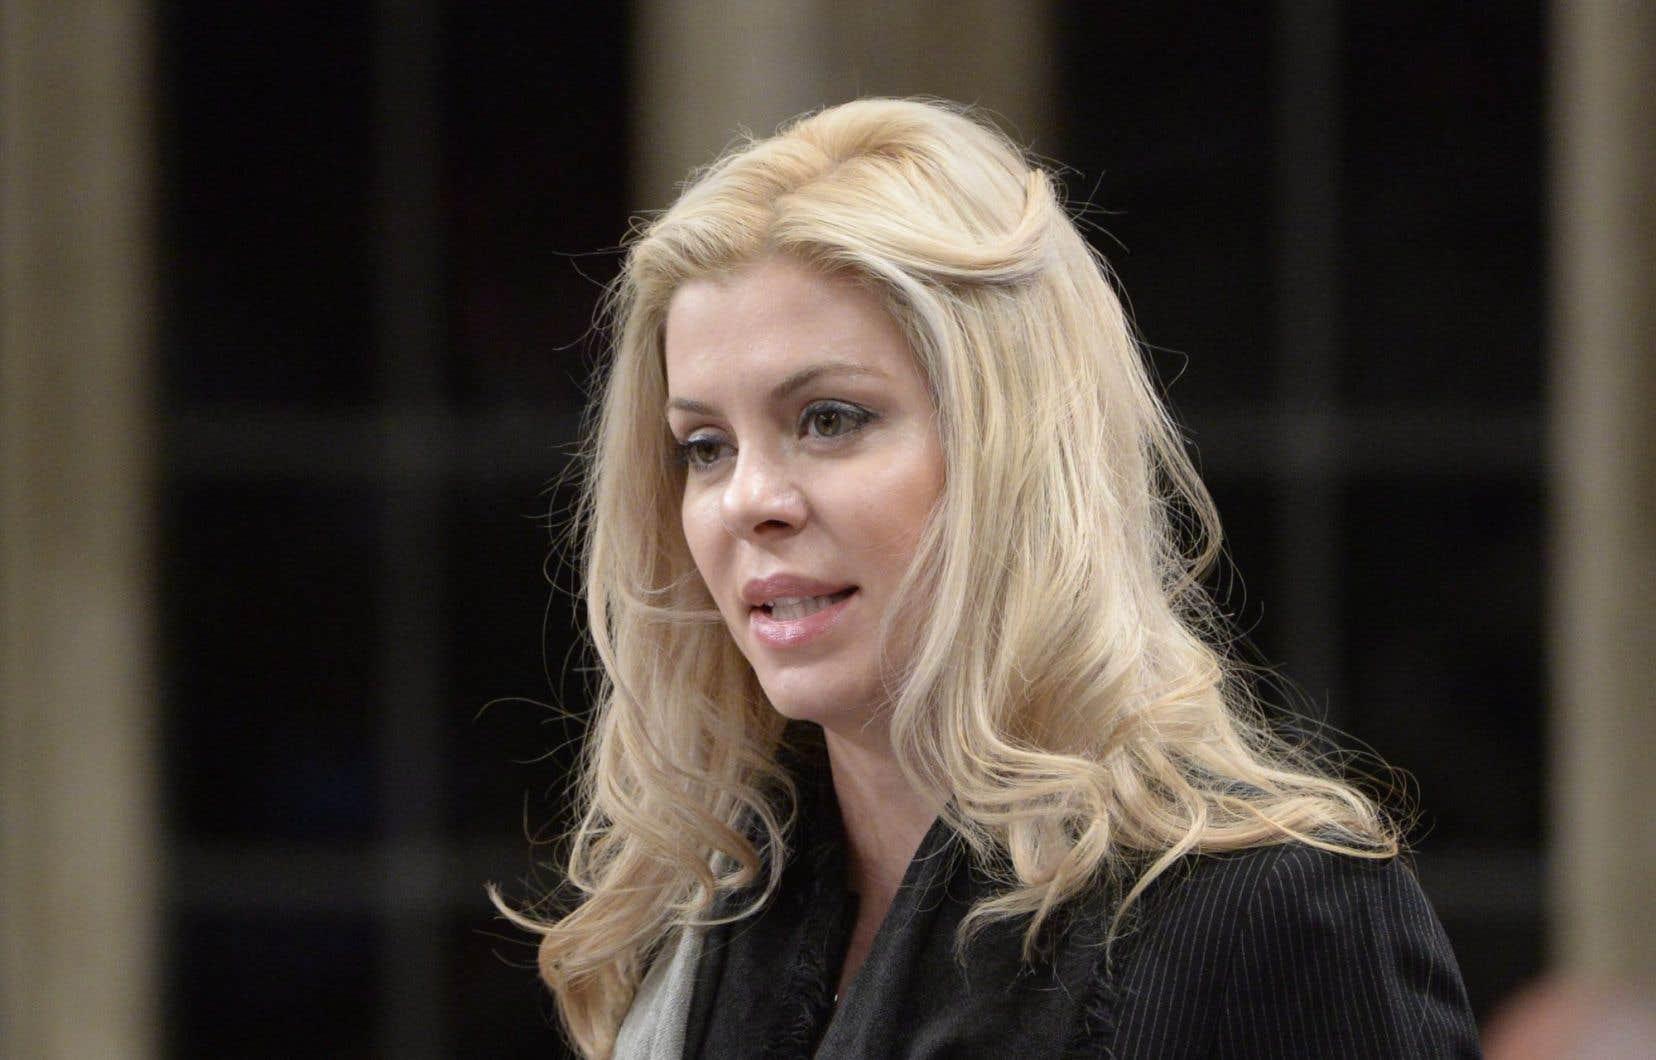 Mme Adams risque d'abord de devoir affronter un autre aspirant candidat libéral, l'avocat Marco Medicino, qui convoite aussi la circonscription d'Eglinton-Lawrence.